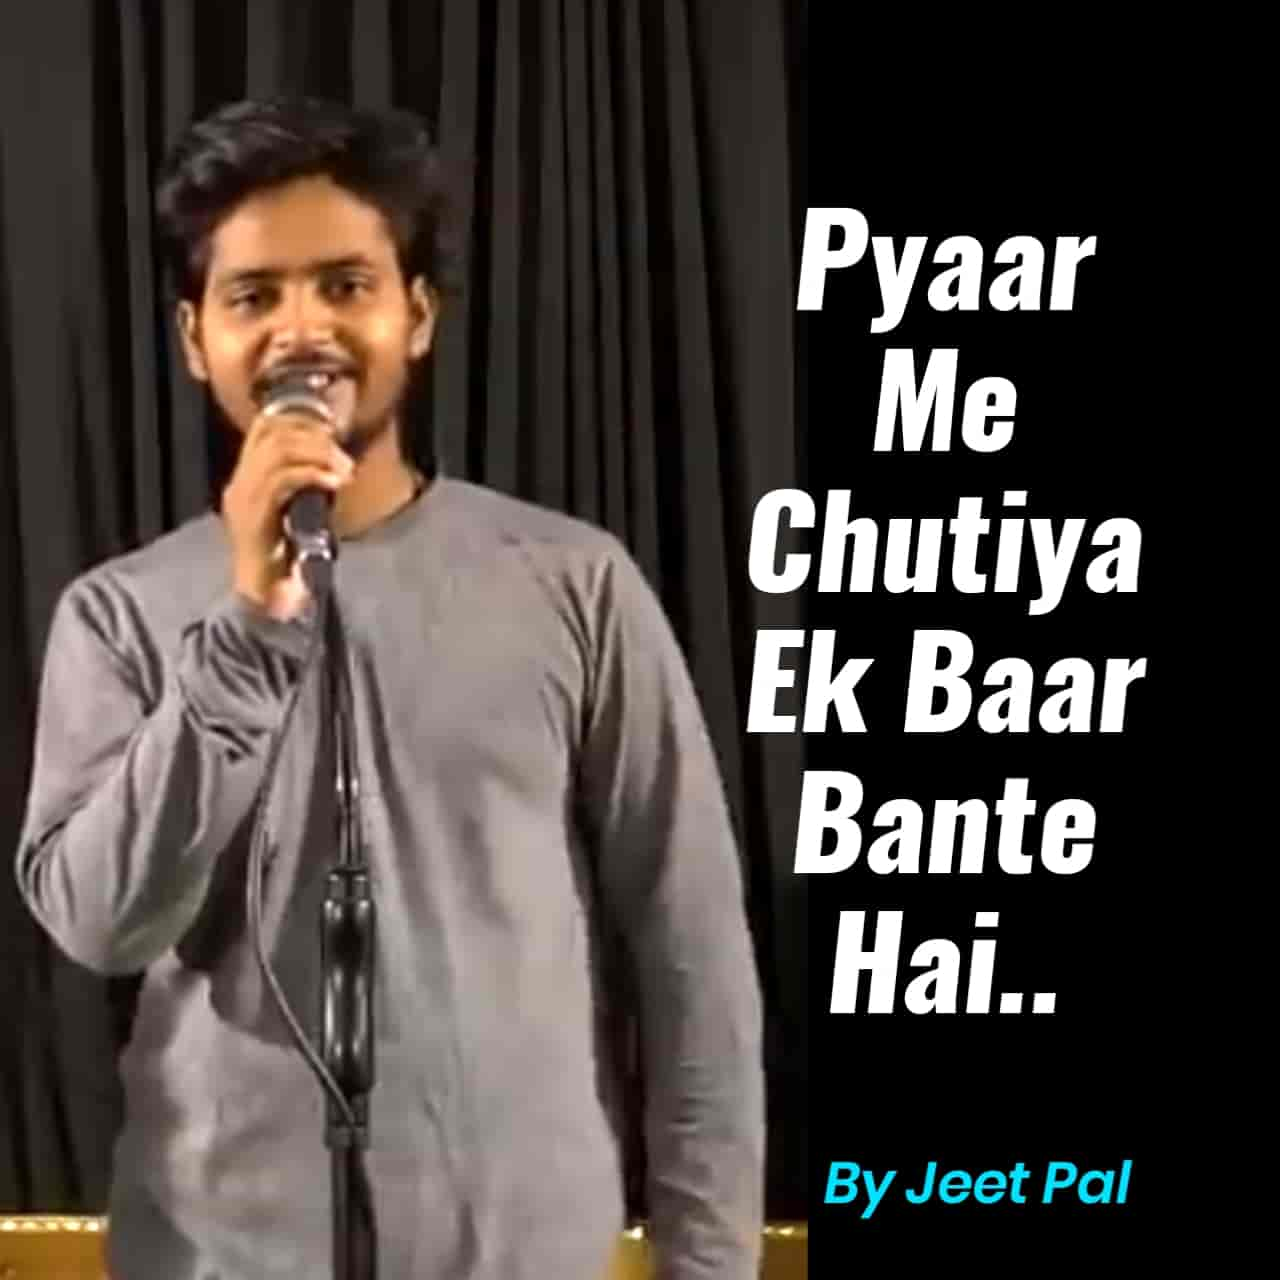 The beautiful heart touching shayari'Pyaar Me Chutiya Ek Baar Bante Hai' for The Pomedian Show is presented byJeet Paland also written by him which is very beautiful and delightful.